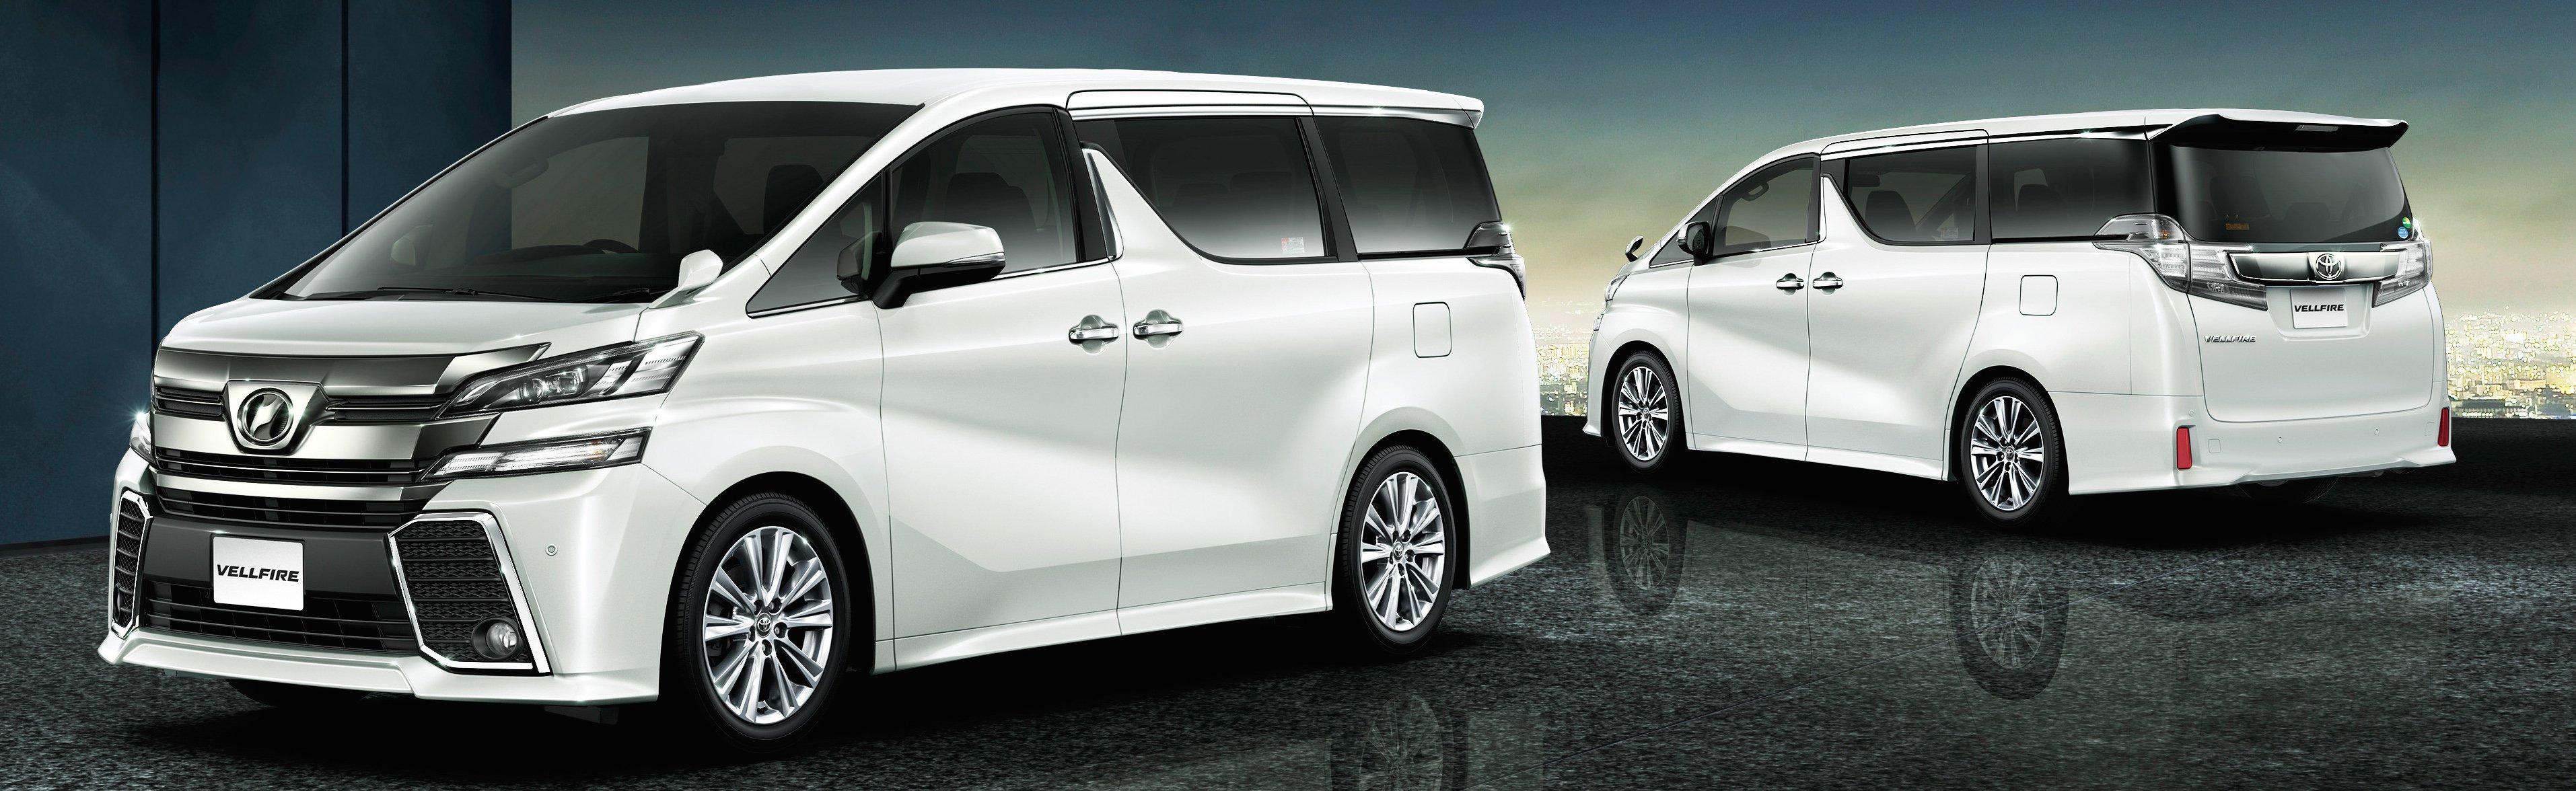 2015 Toyota Alphard and Vellfire unveiled - full details